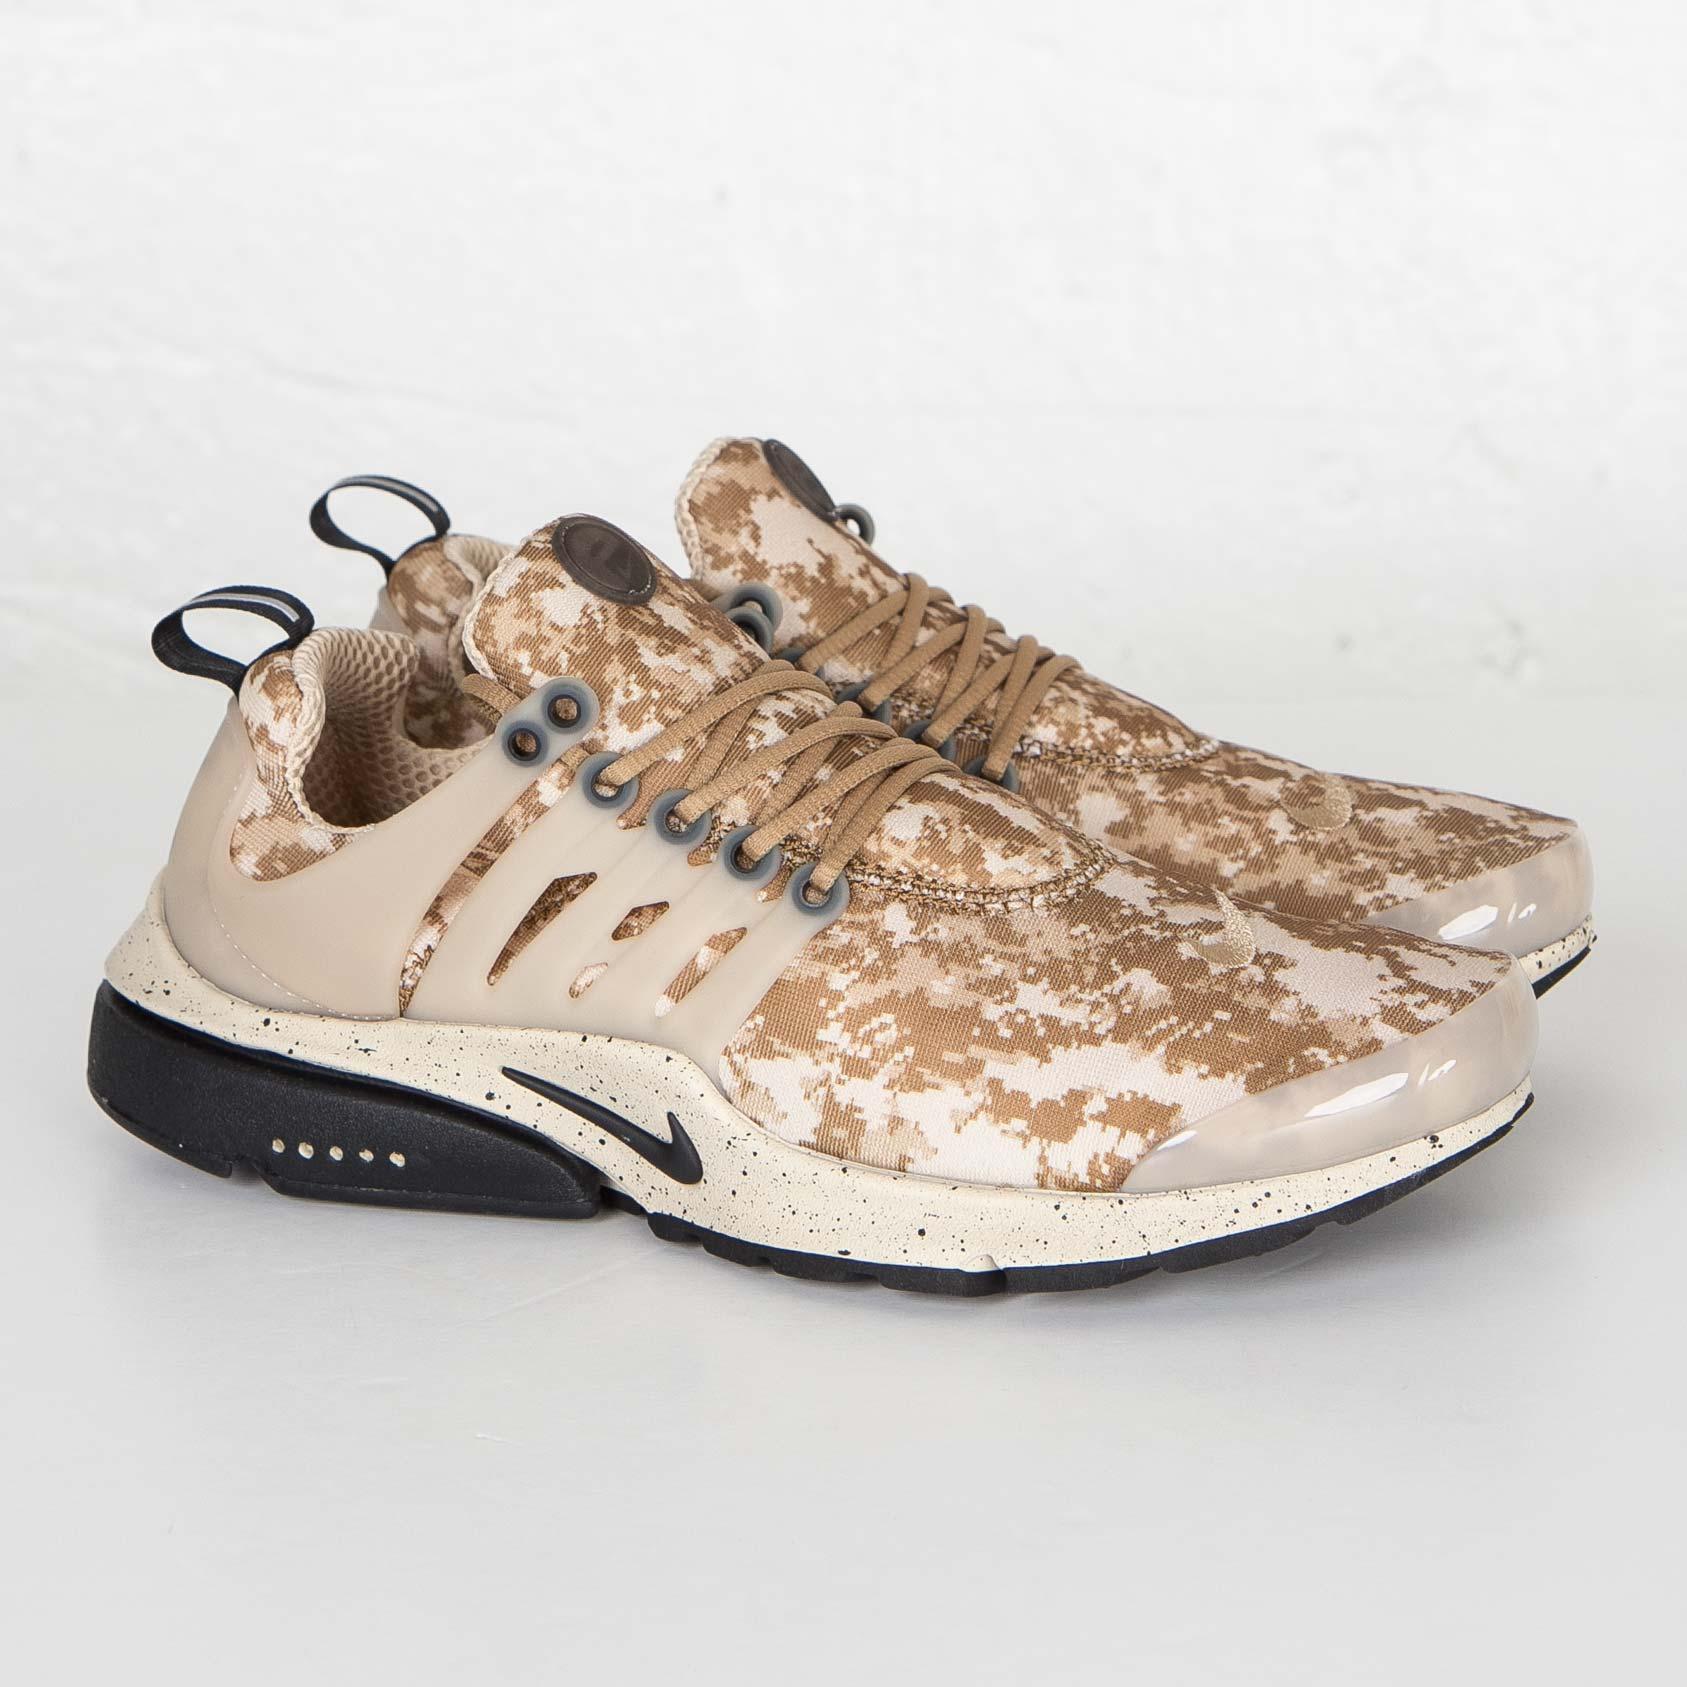 ff1827b81590 Nike Air Presto GPX - 819521-200 - Sneakersnstuff